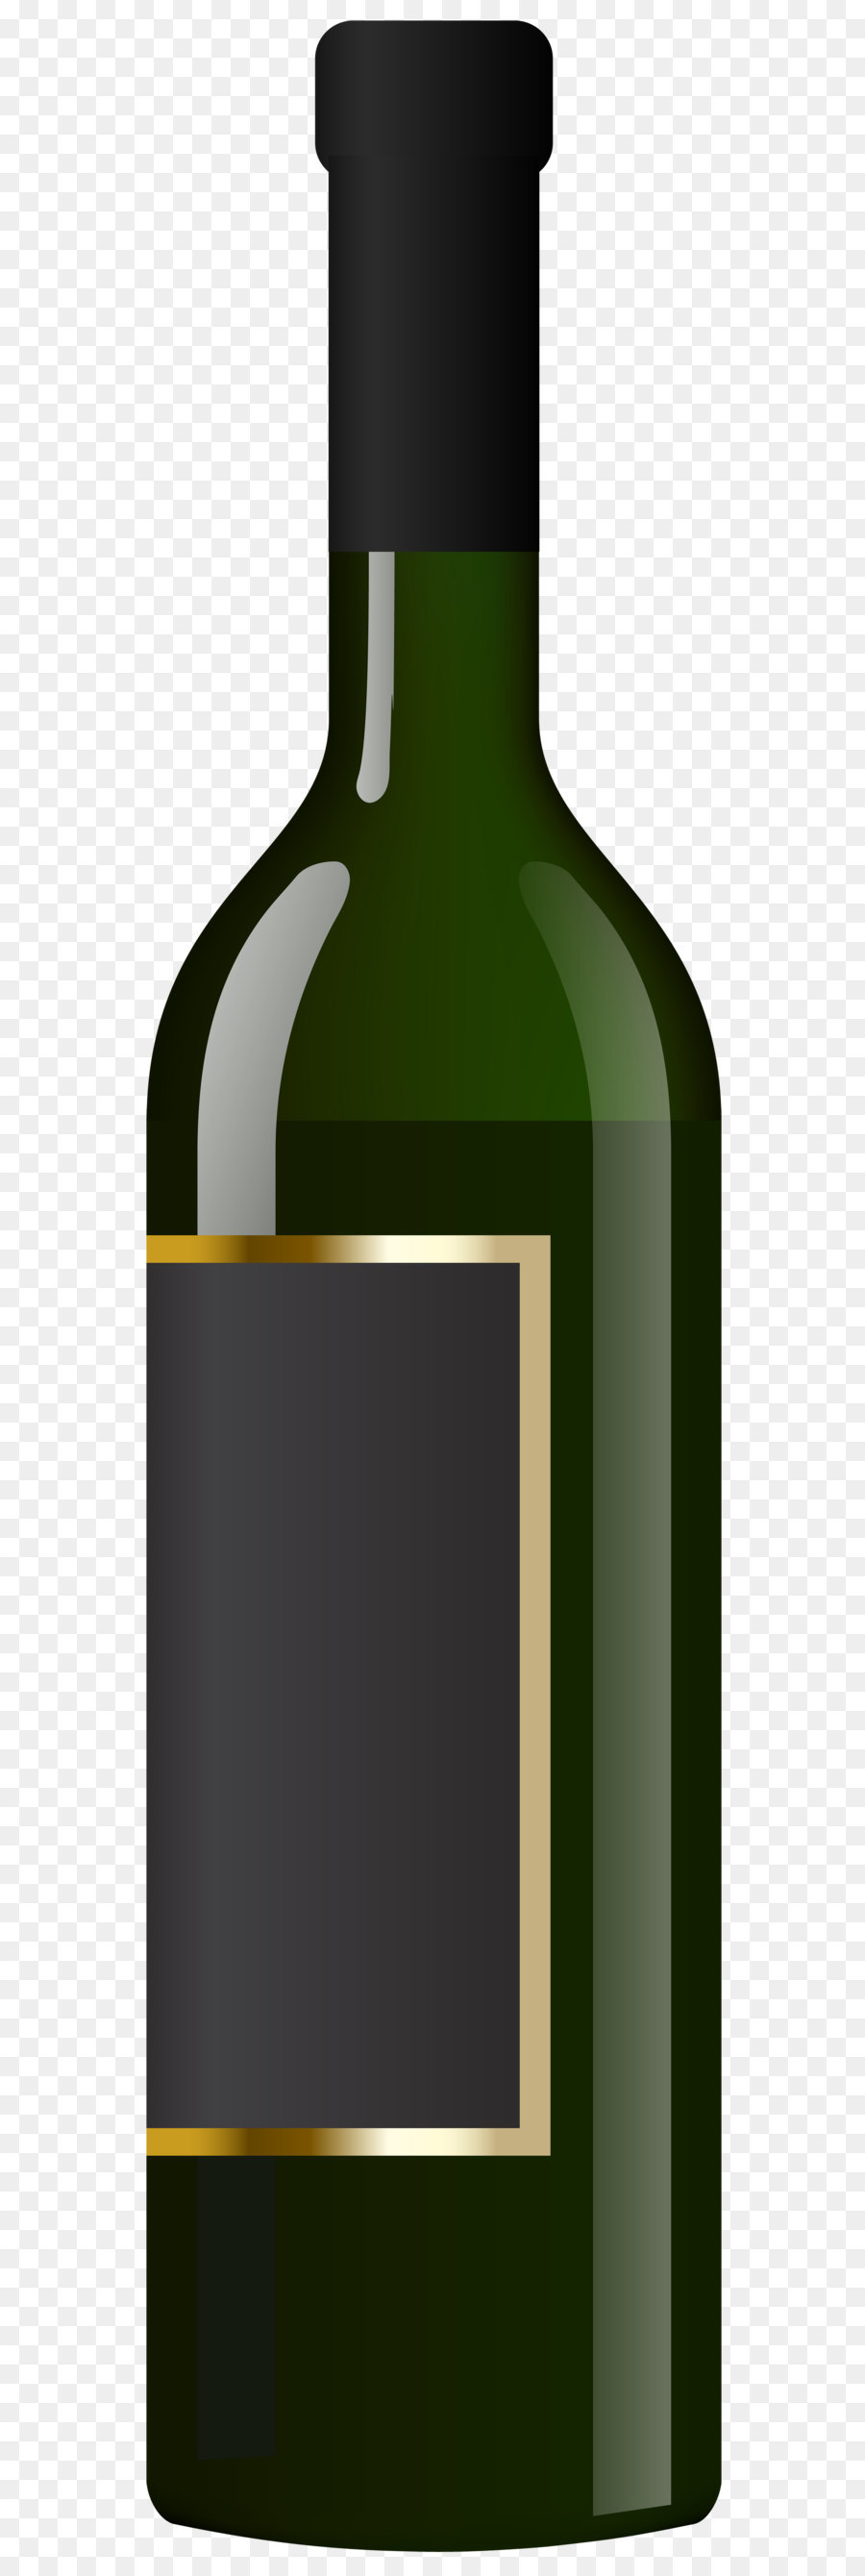 Free Transparent Wine Bottle, Download Free Clip Art, Free.